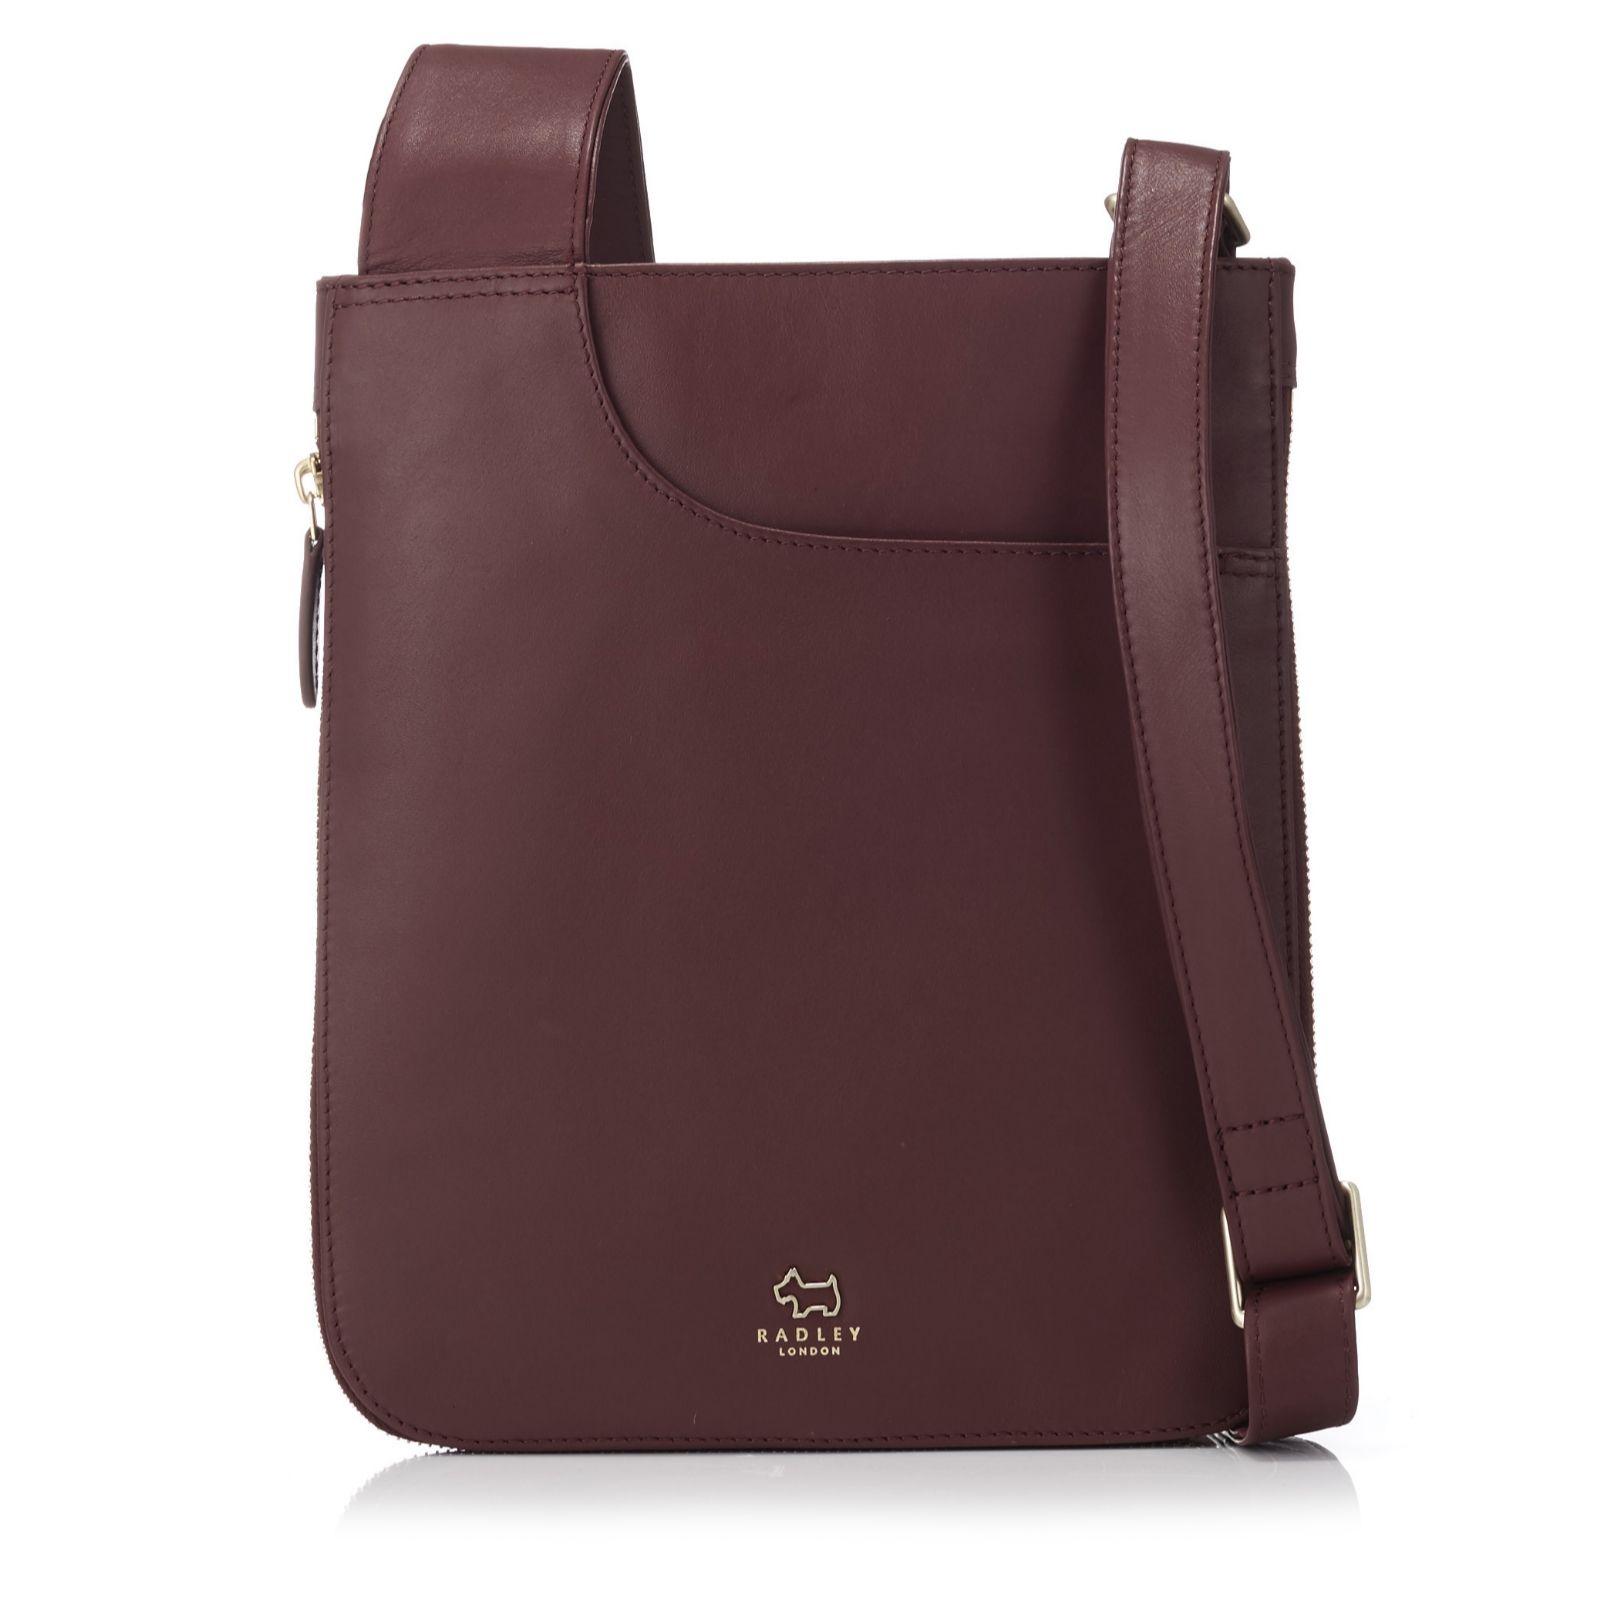 Radley London Pockets Medium Leather Zip Top Crossbody Bag - QVC UK 77512b6c190ff